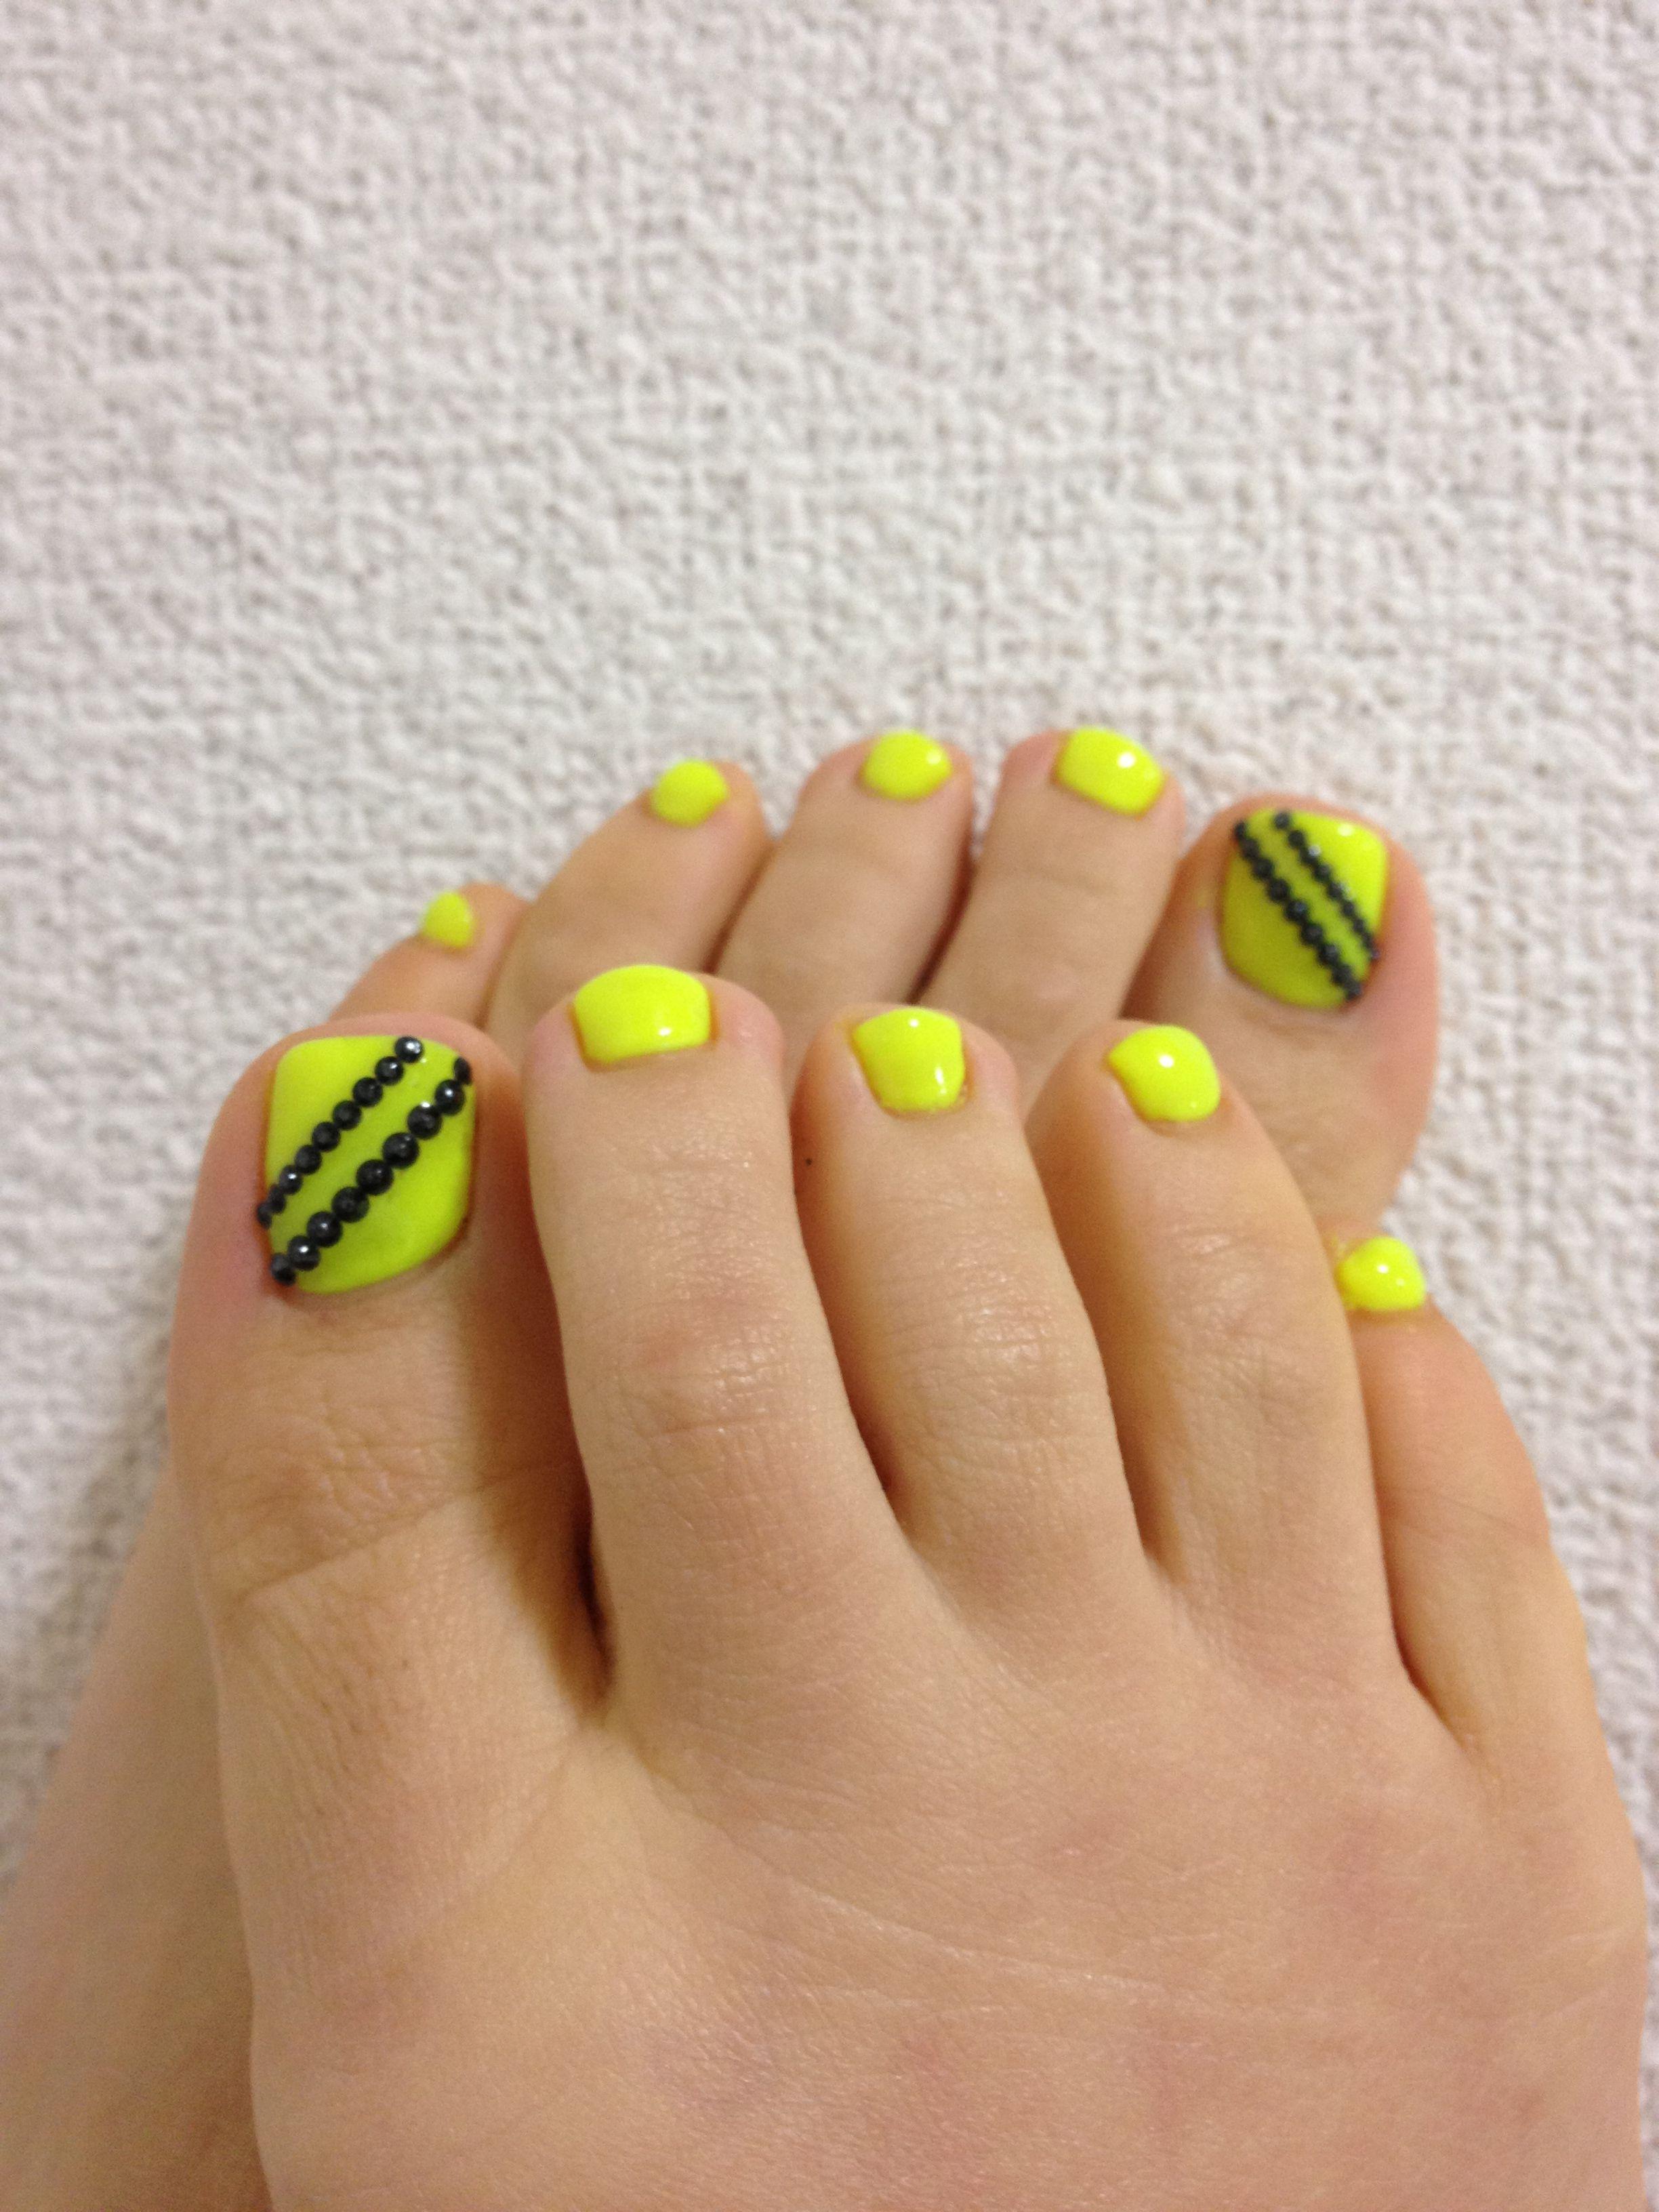 neon yellow nails | NAILS | Pinterest